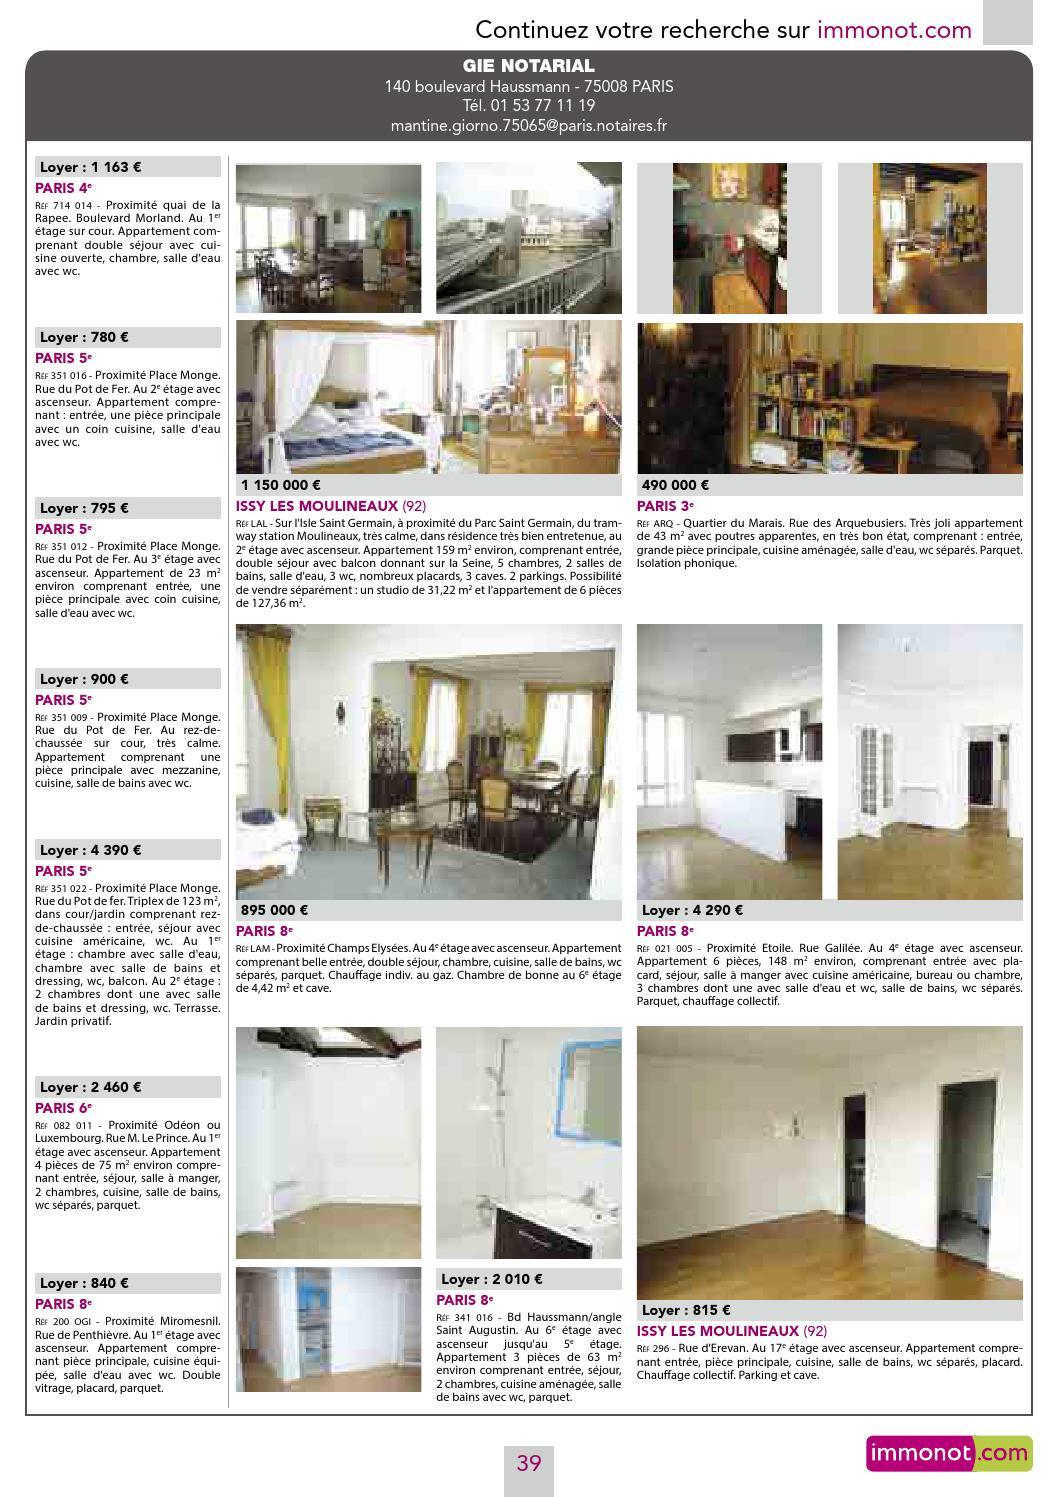 Salle De Bain Avec 2 Entrees magazine immobilier des notairesnicolas dubernard - issuu